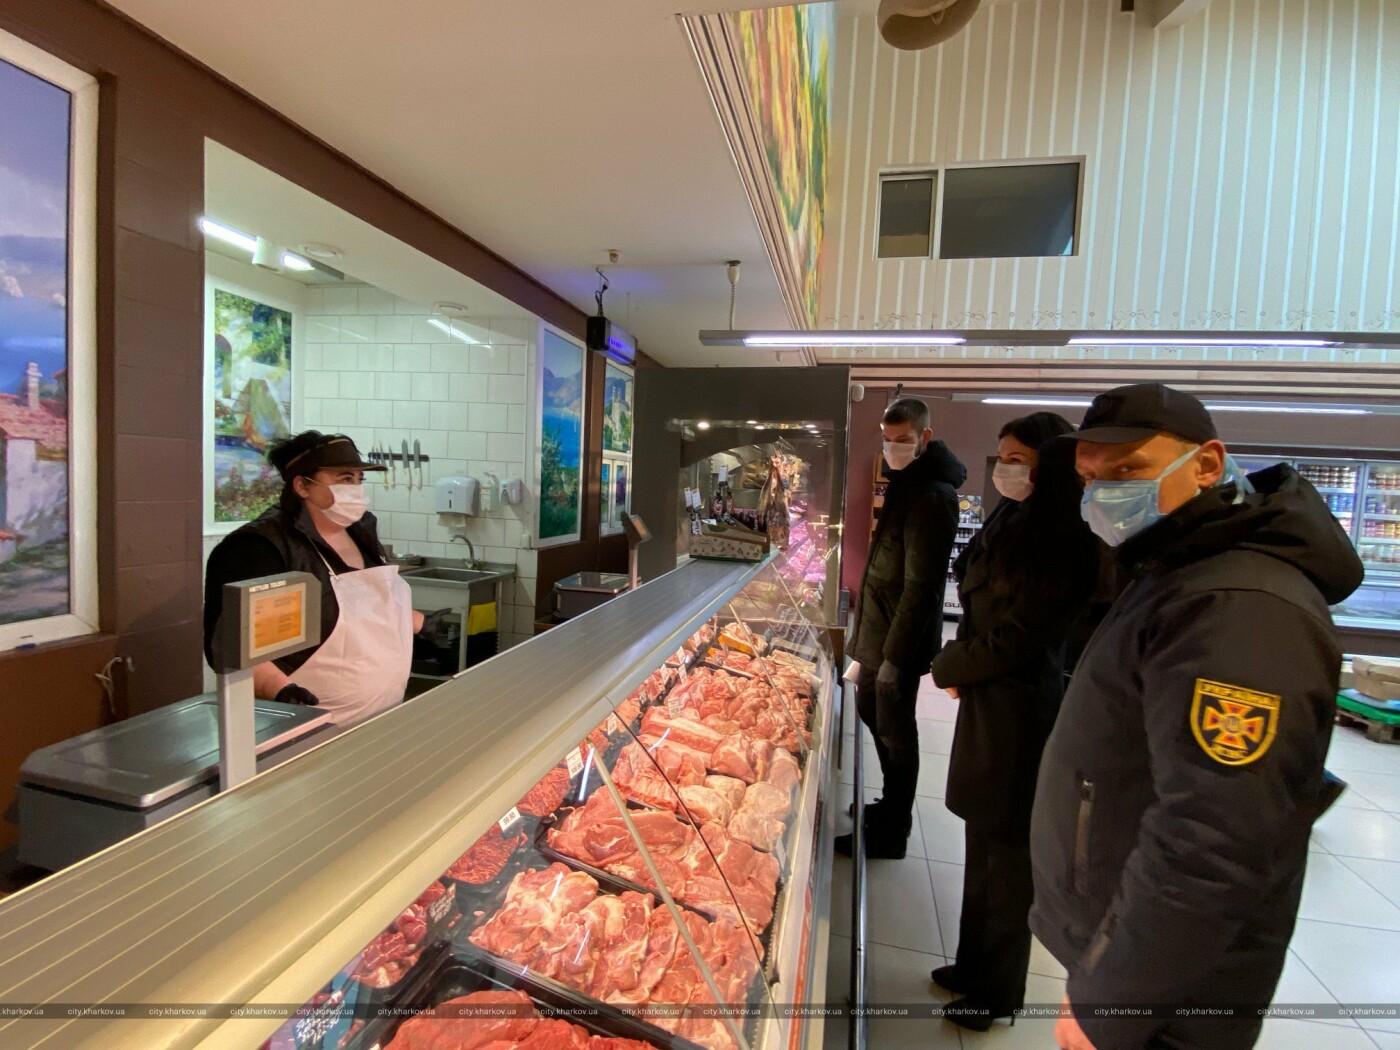 В Харькове проверили работу двух супермаркетов во время карантина, - ФОТО, фото-2